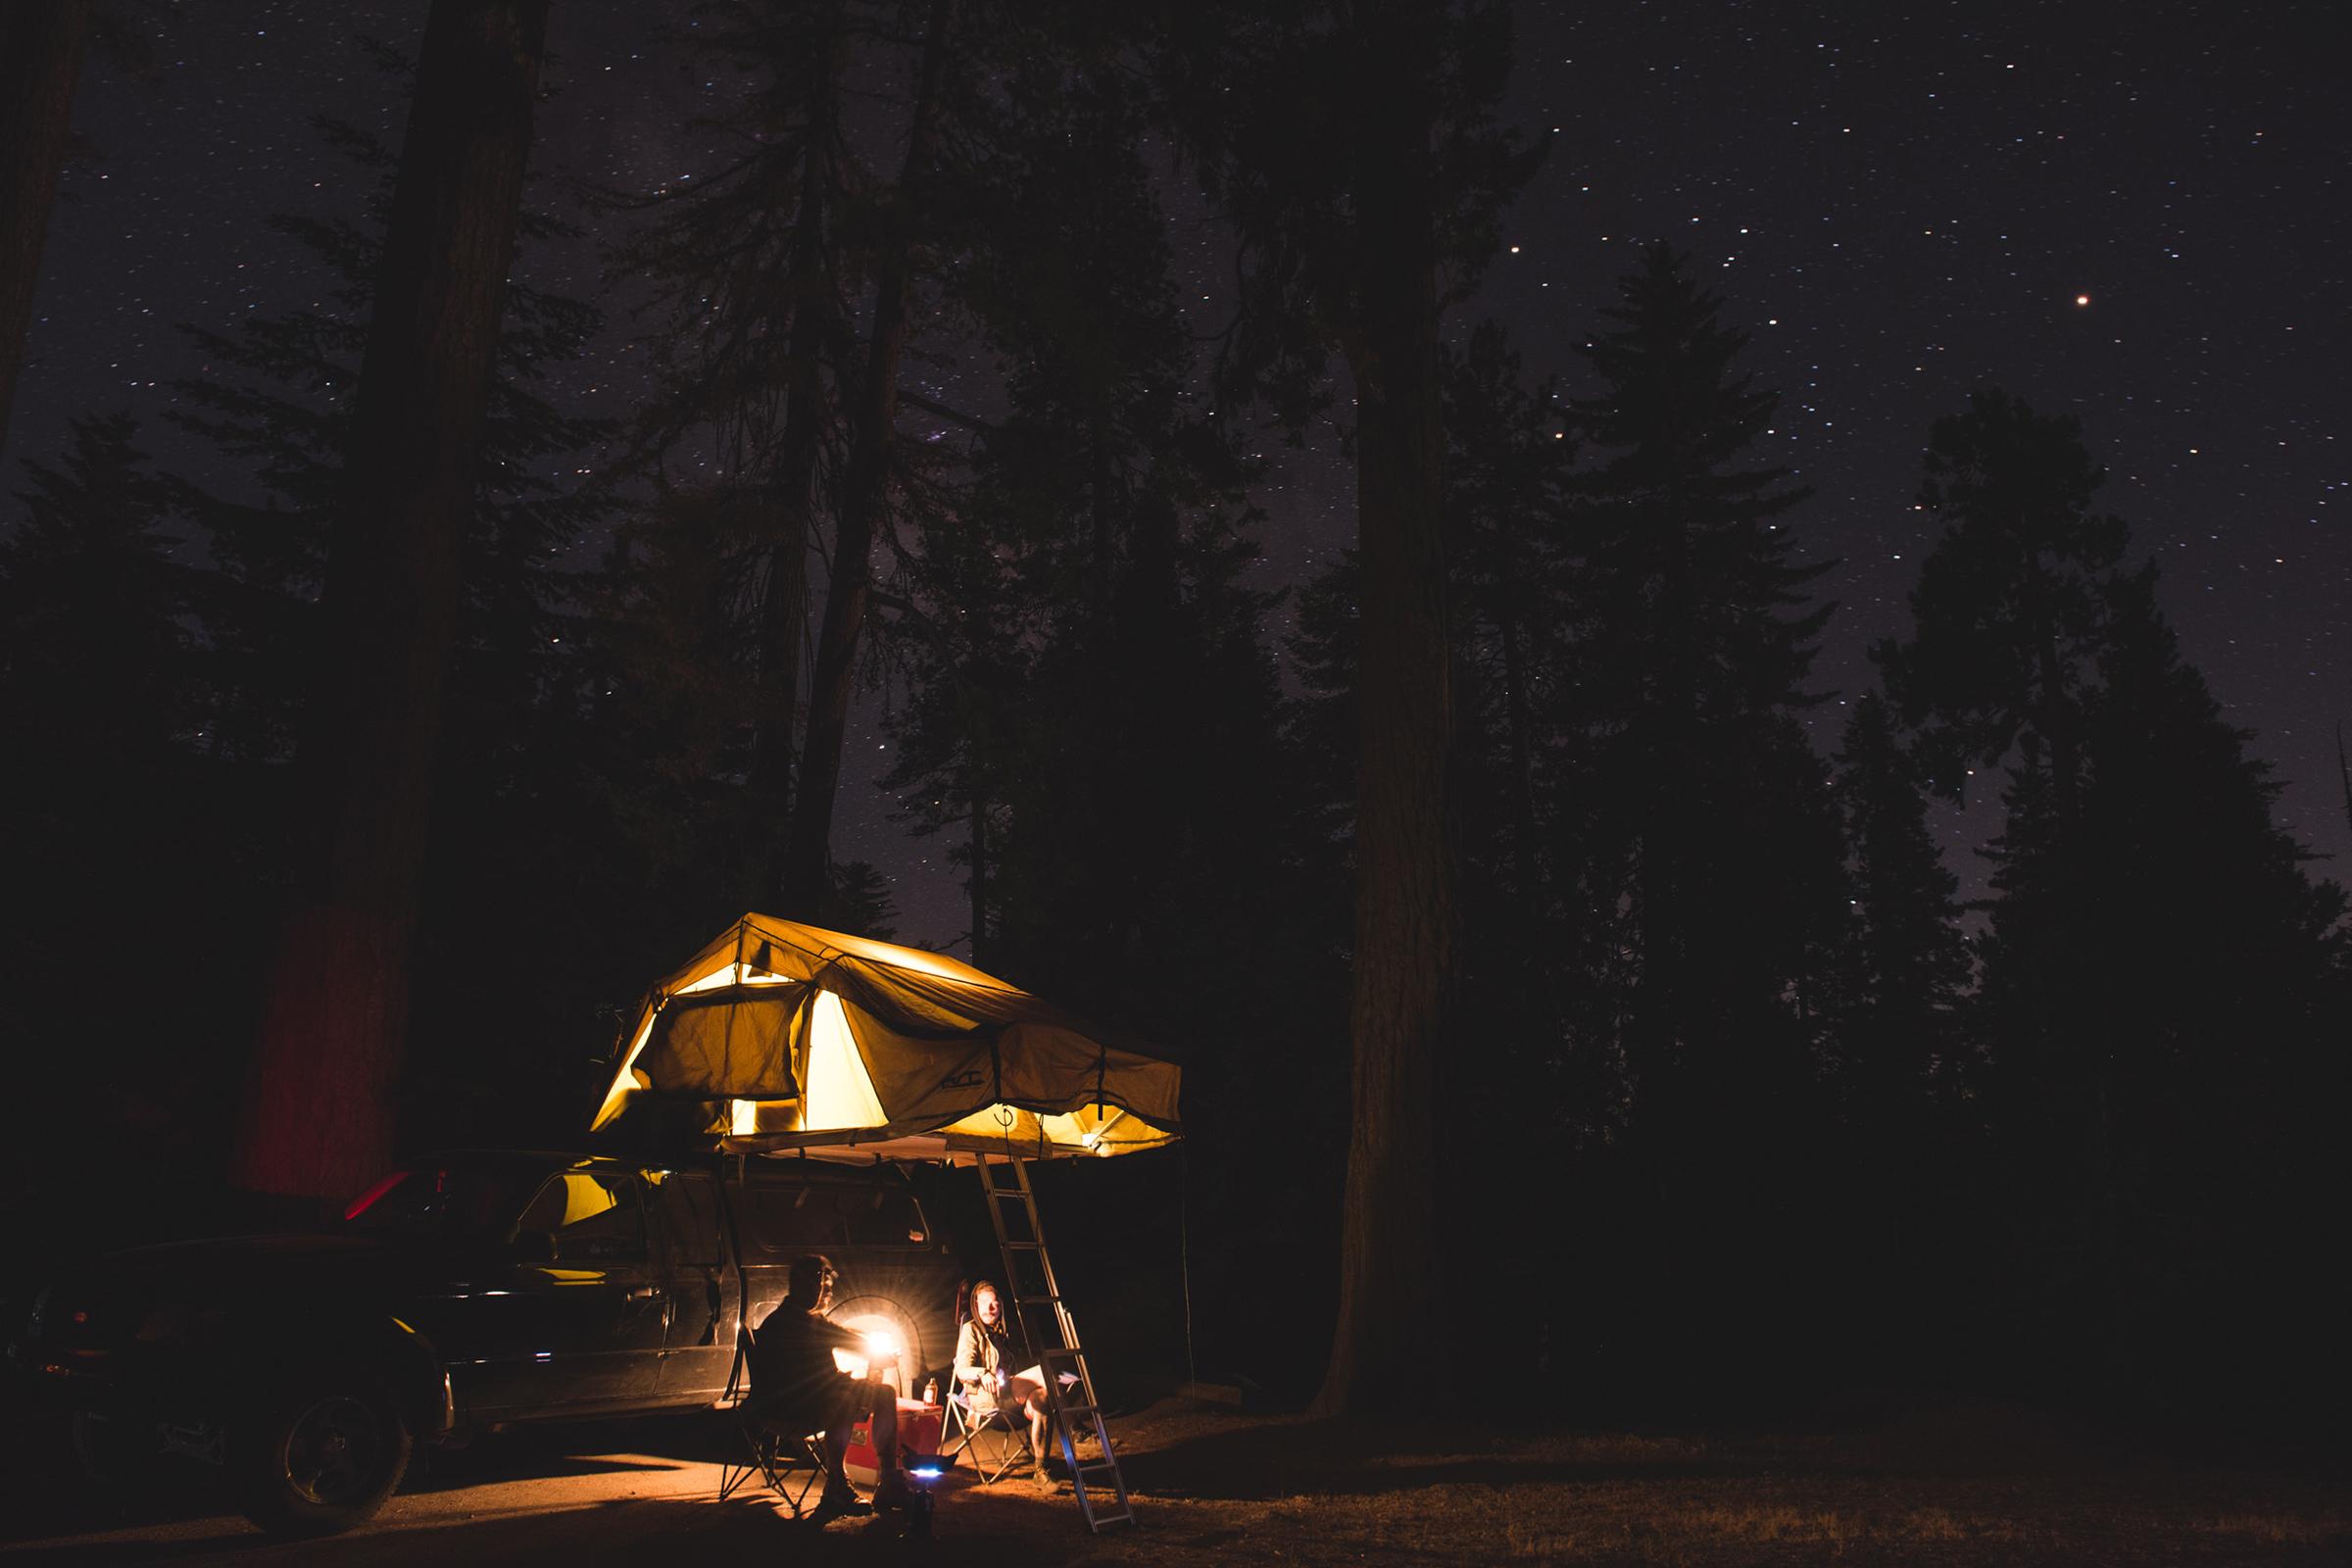 full_clif-sequoia-roof-tent.jpg